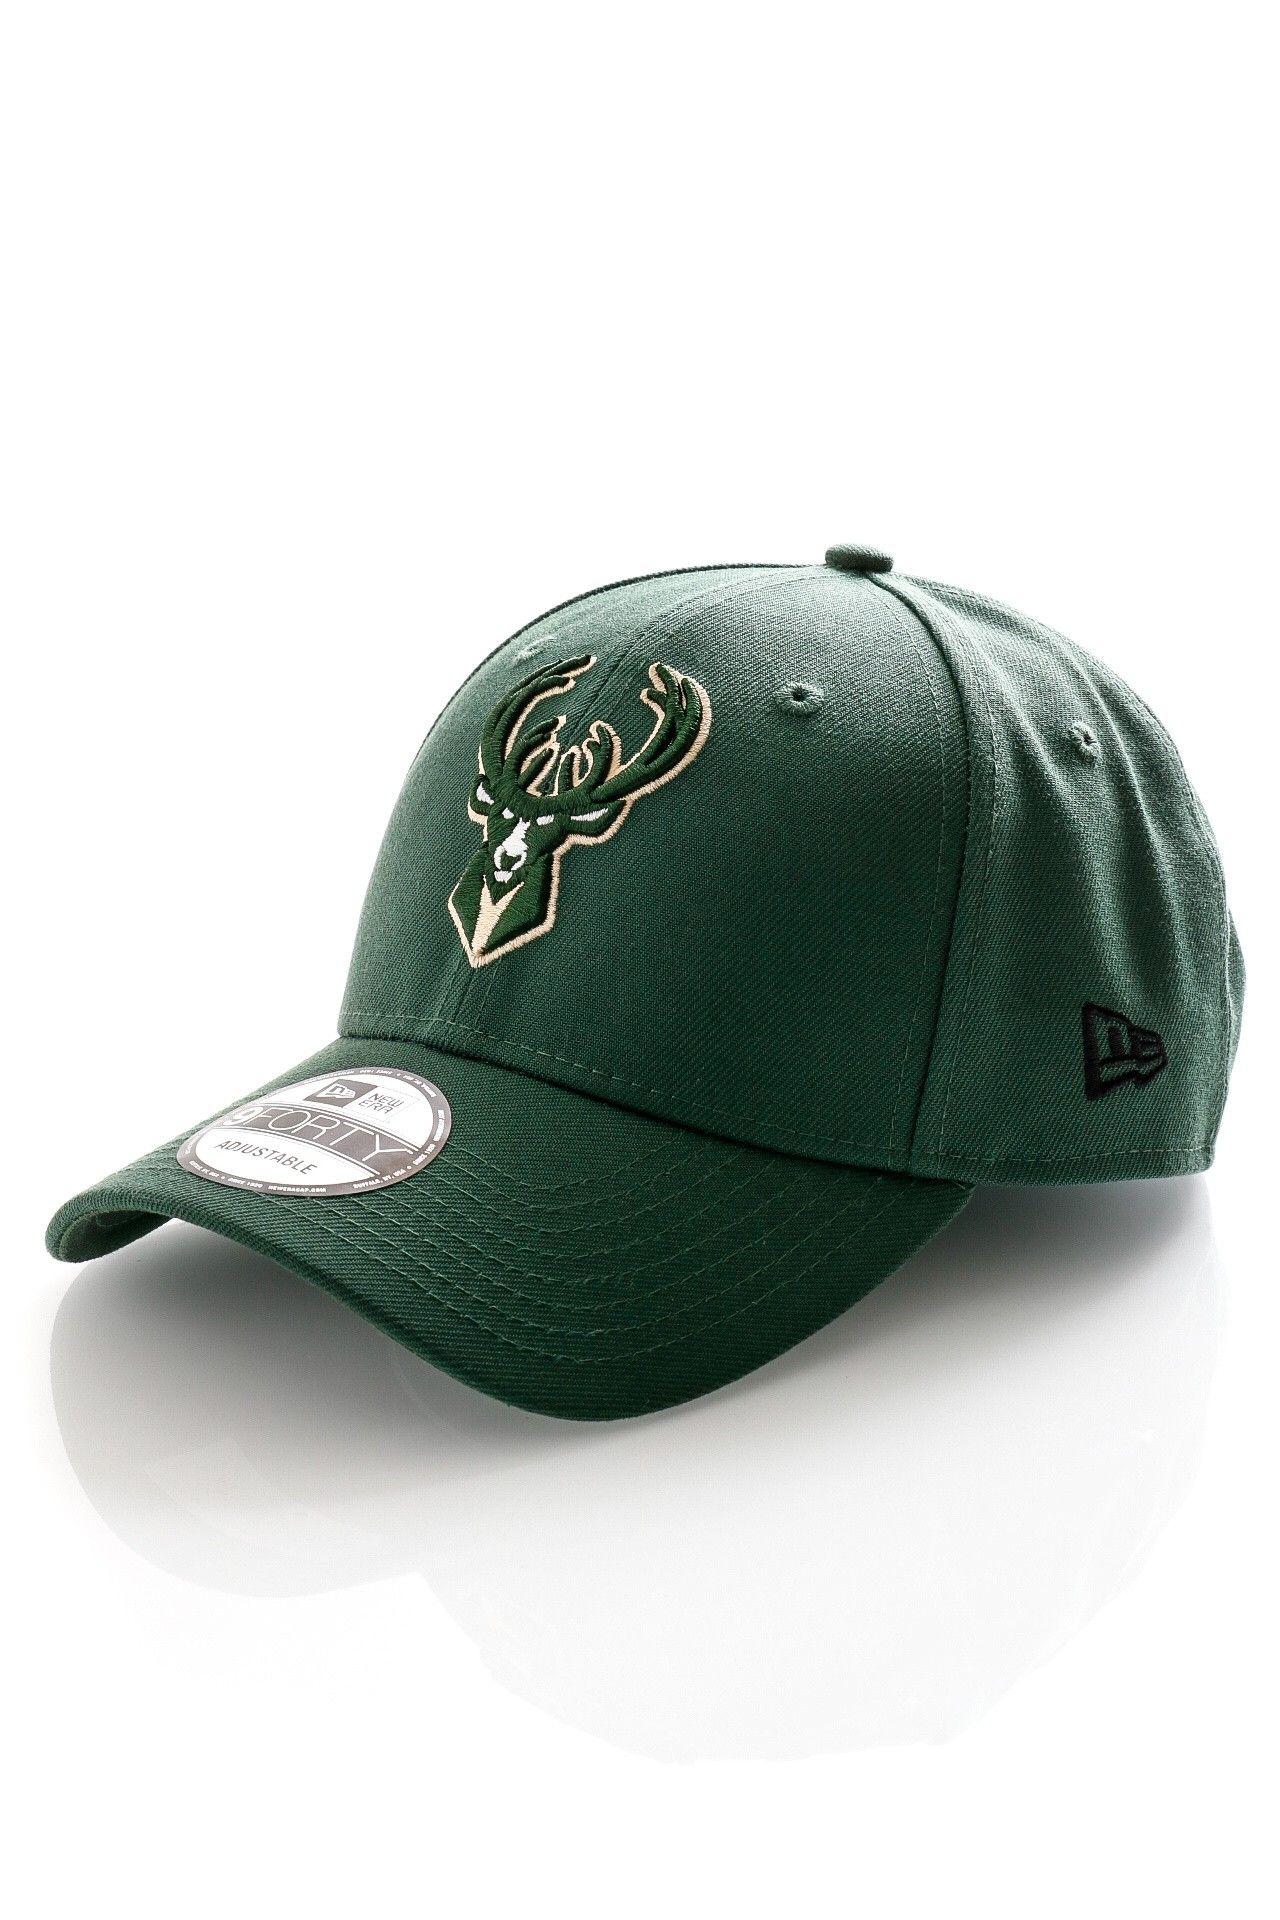 Afbeelding van New Era Dad Cap Milwaukee Bucks The league Milwaukee Bucks 11405602